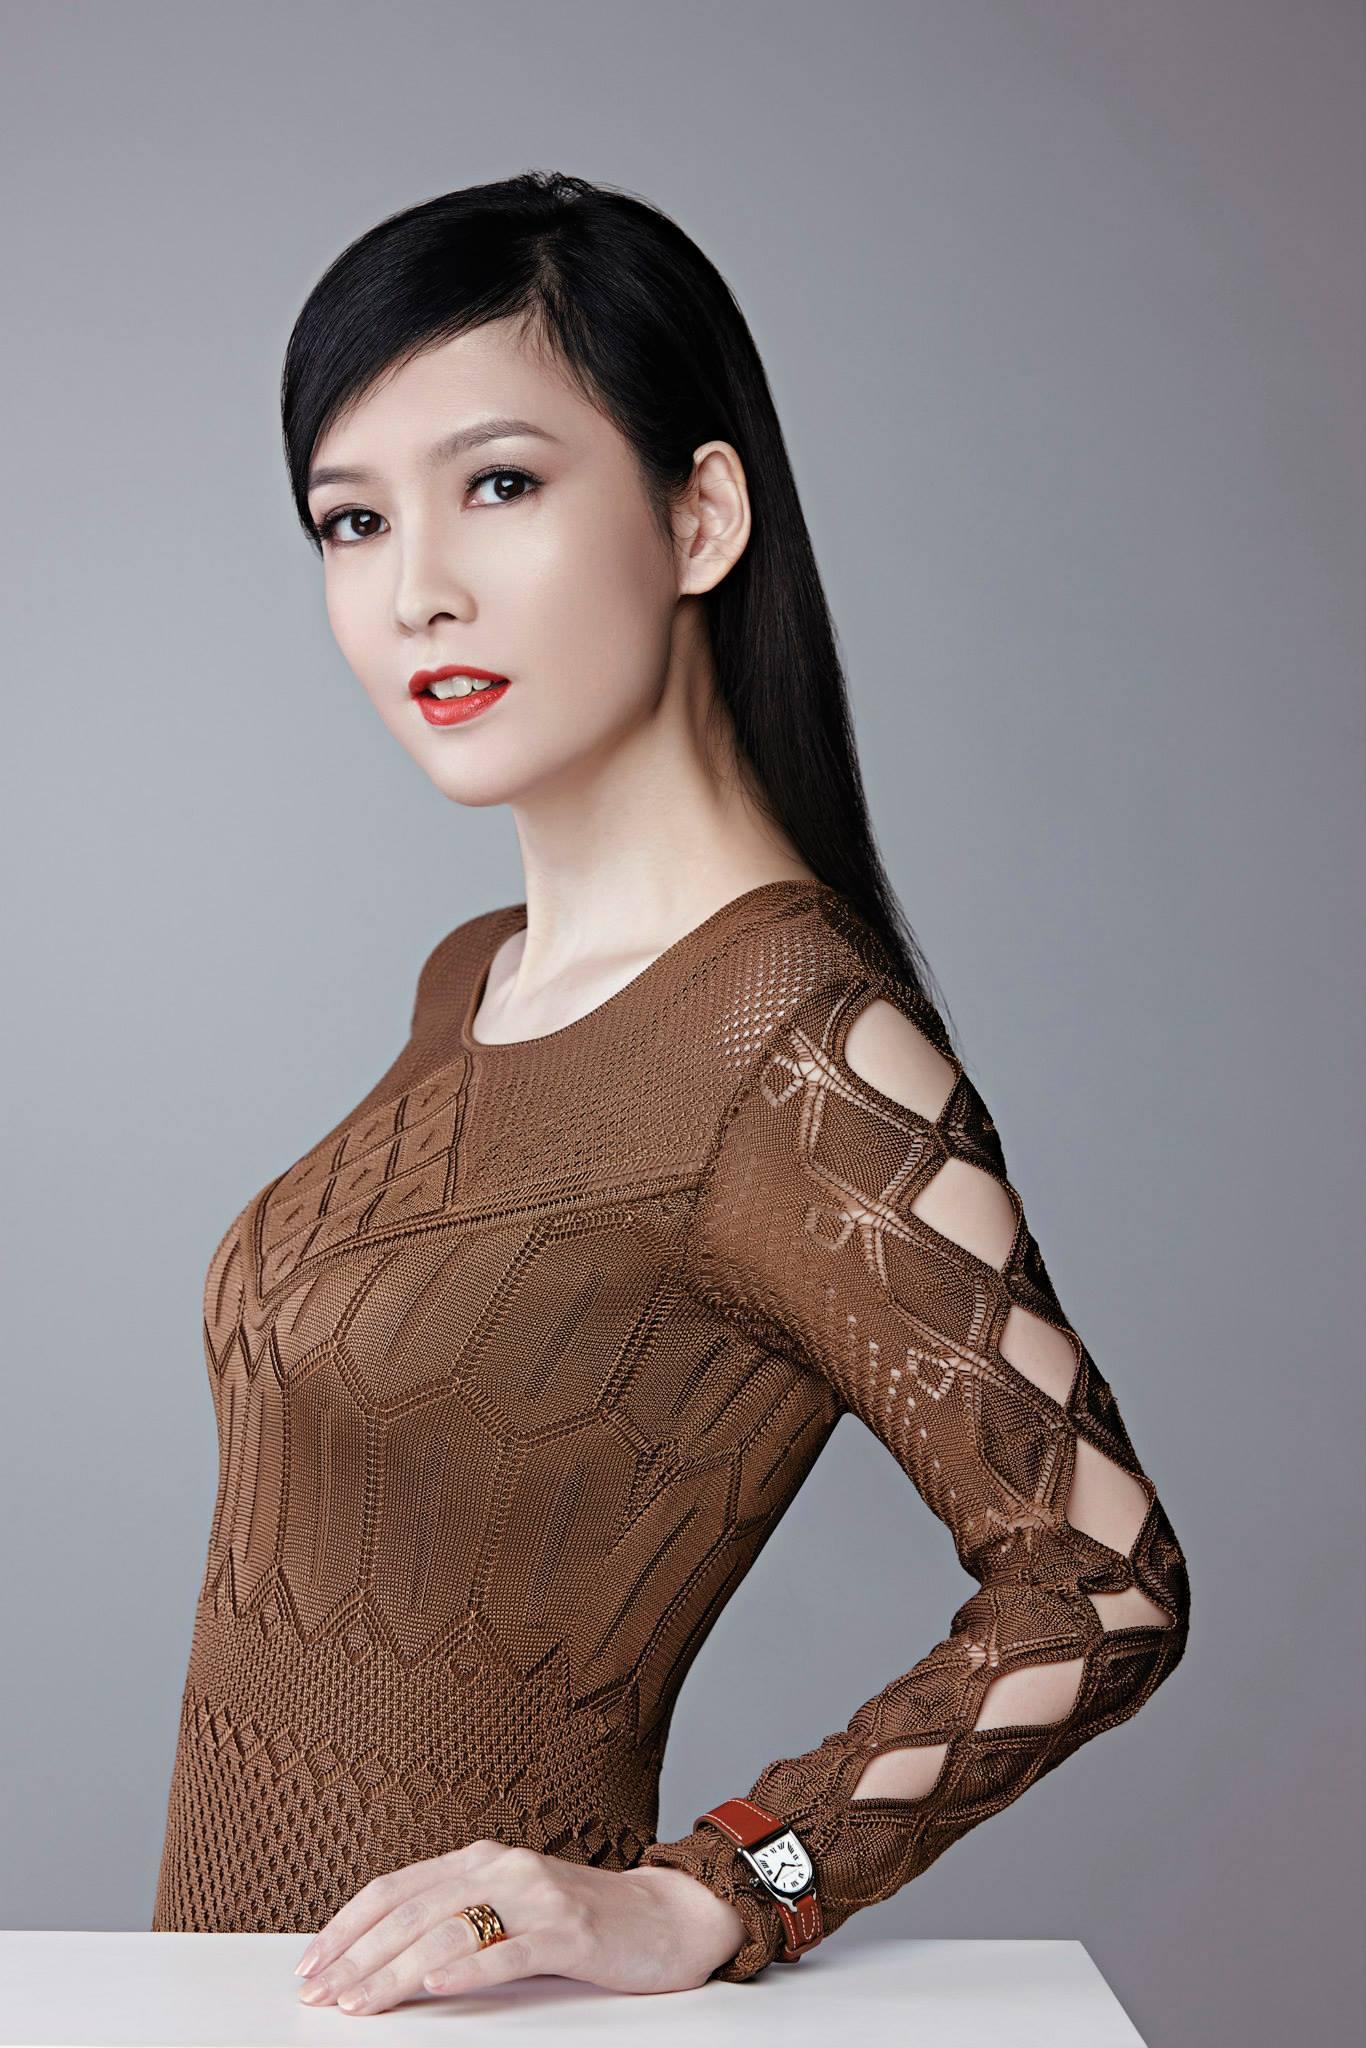 Vivian Chow naked (67 photo), Pussy, Bikini, Boobs, cleavage 2019